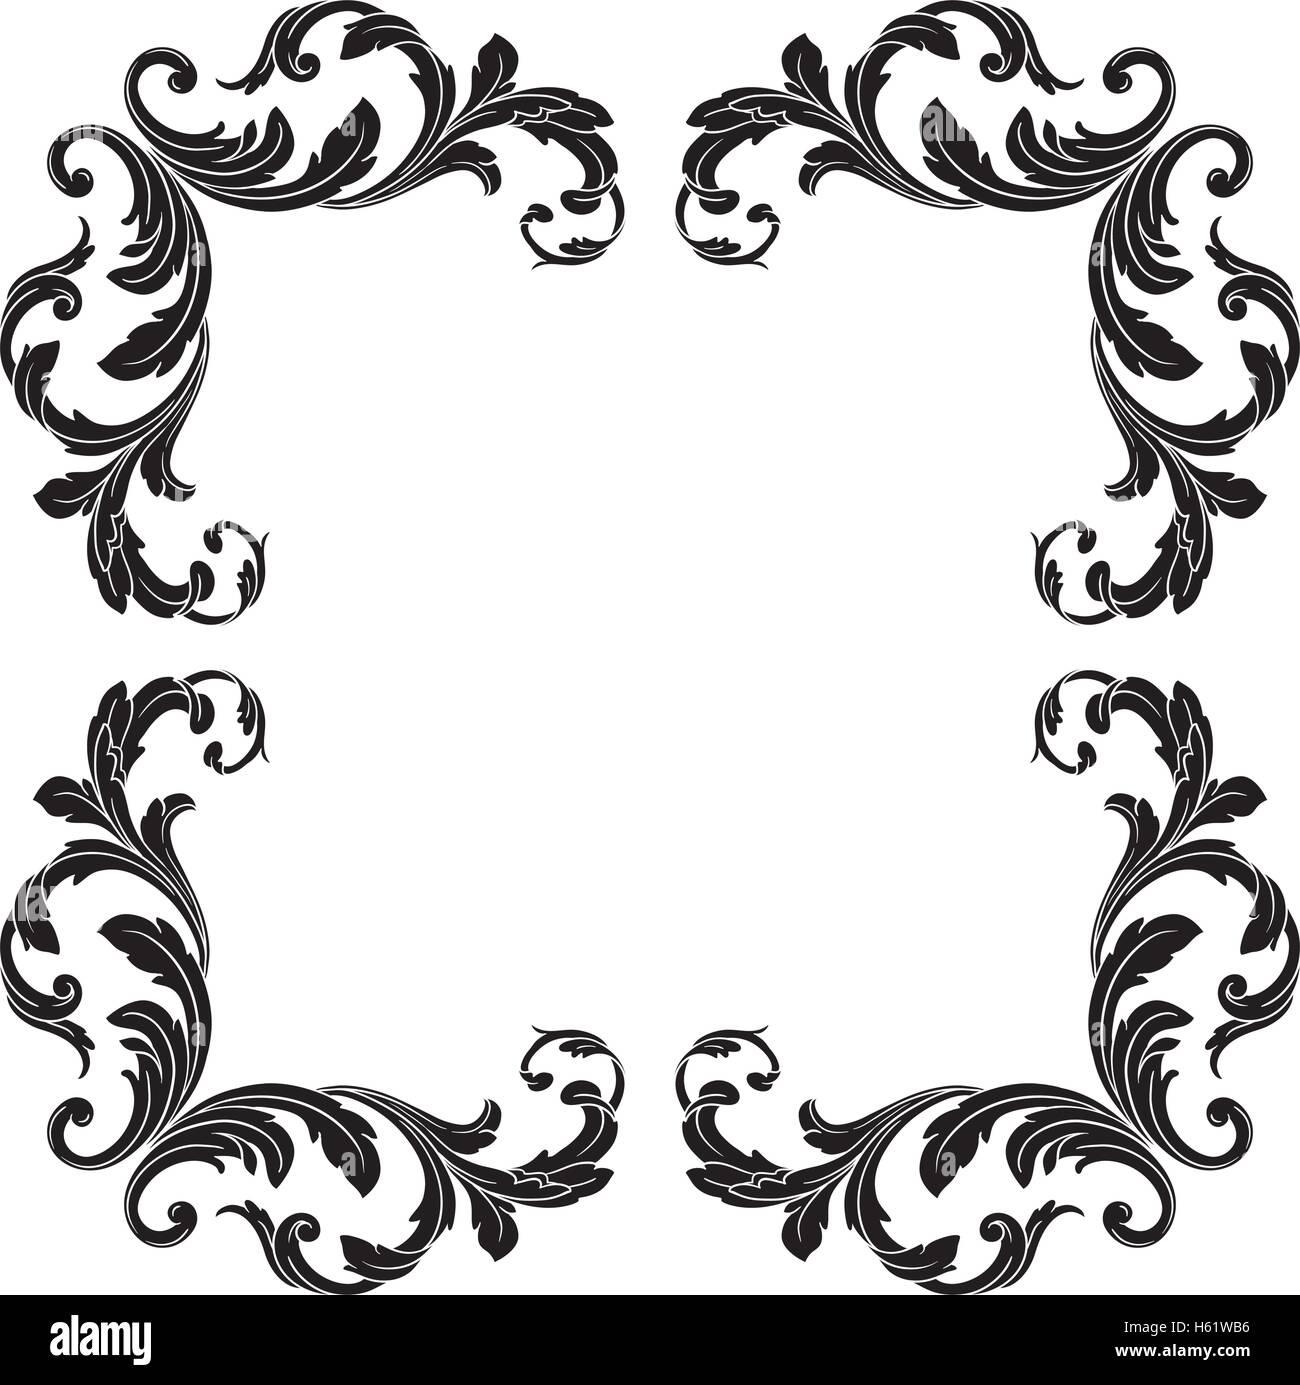 vintage baroque frame scroll ornament engraving border floral retro rh alamy com black and white damask border clip art